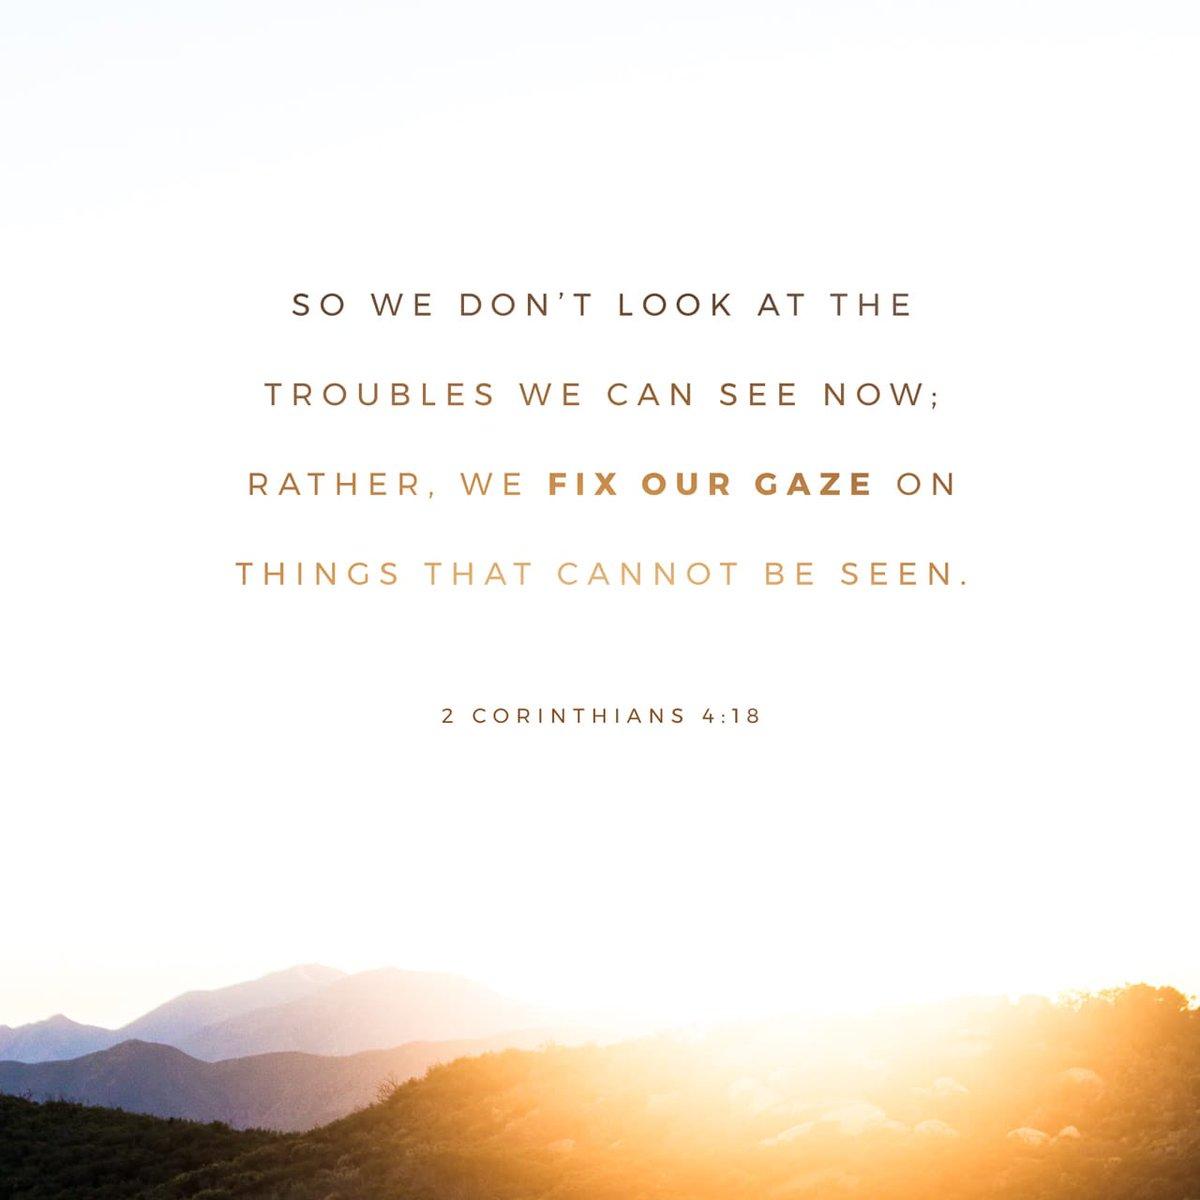 #Bible #VOTD #Look #Troubles #Seen #Temporal #Transient #Unseen #Eternal #God #Fix #Eyes #On #Jesus